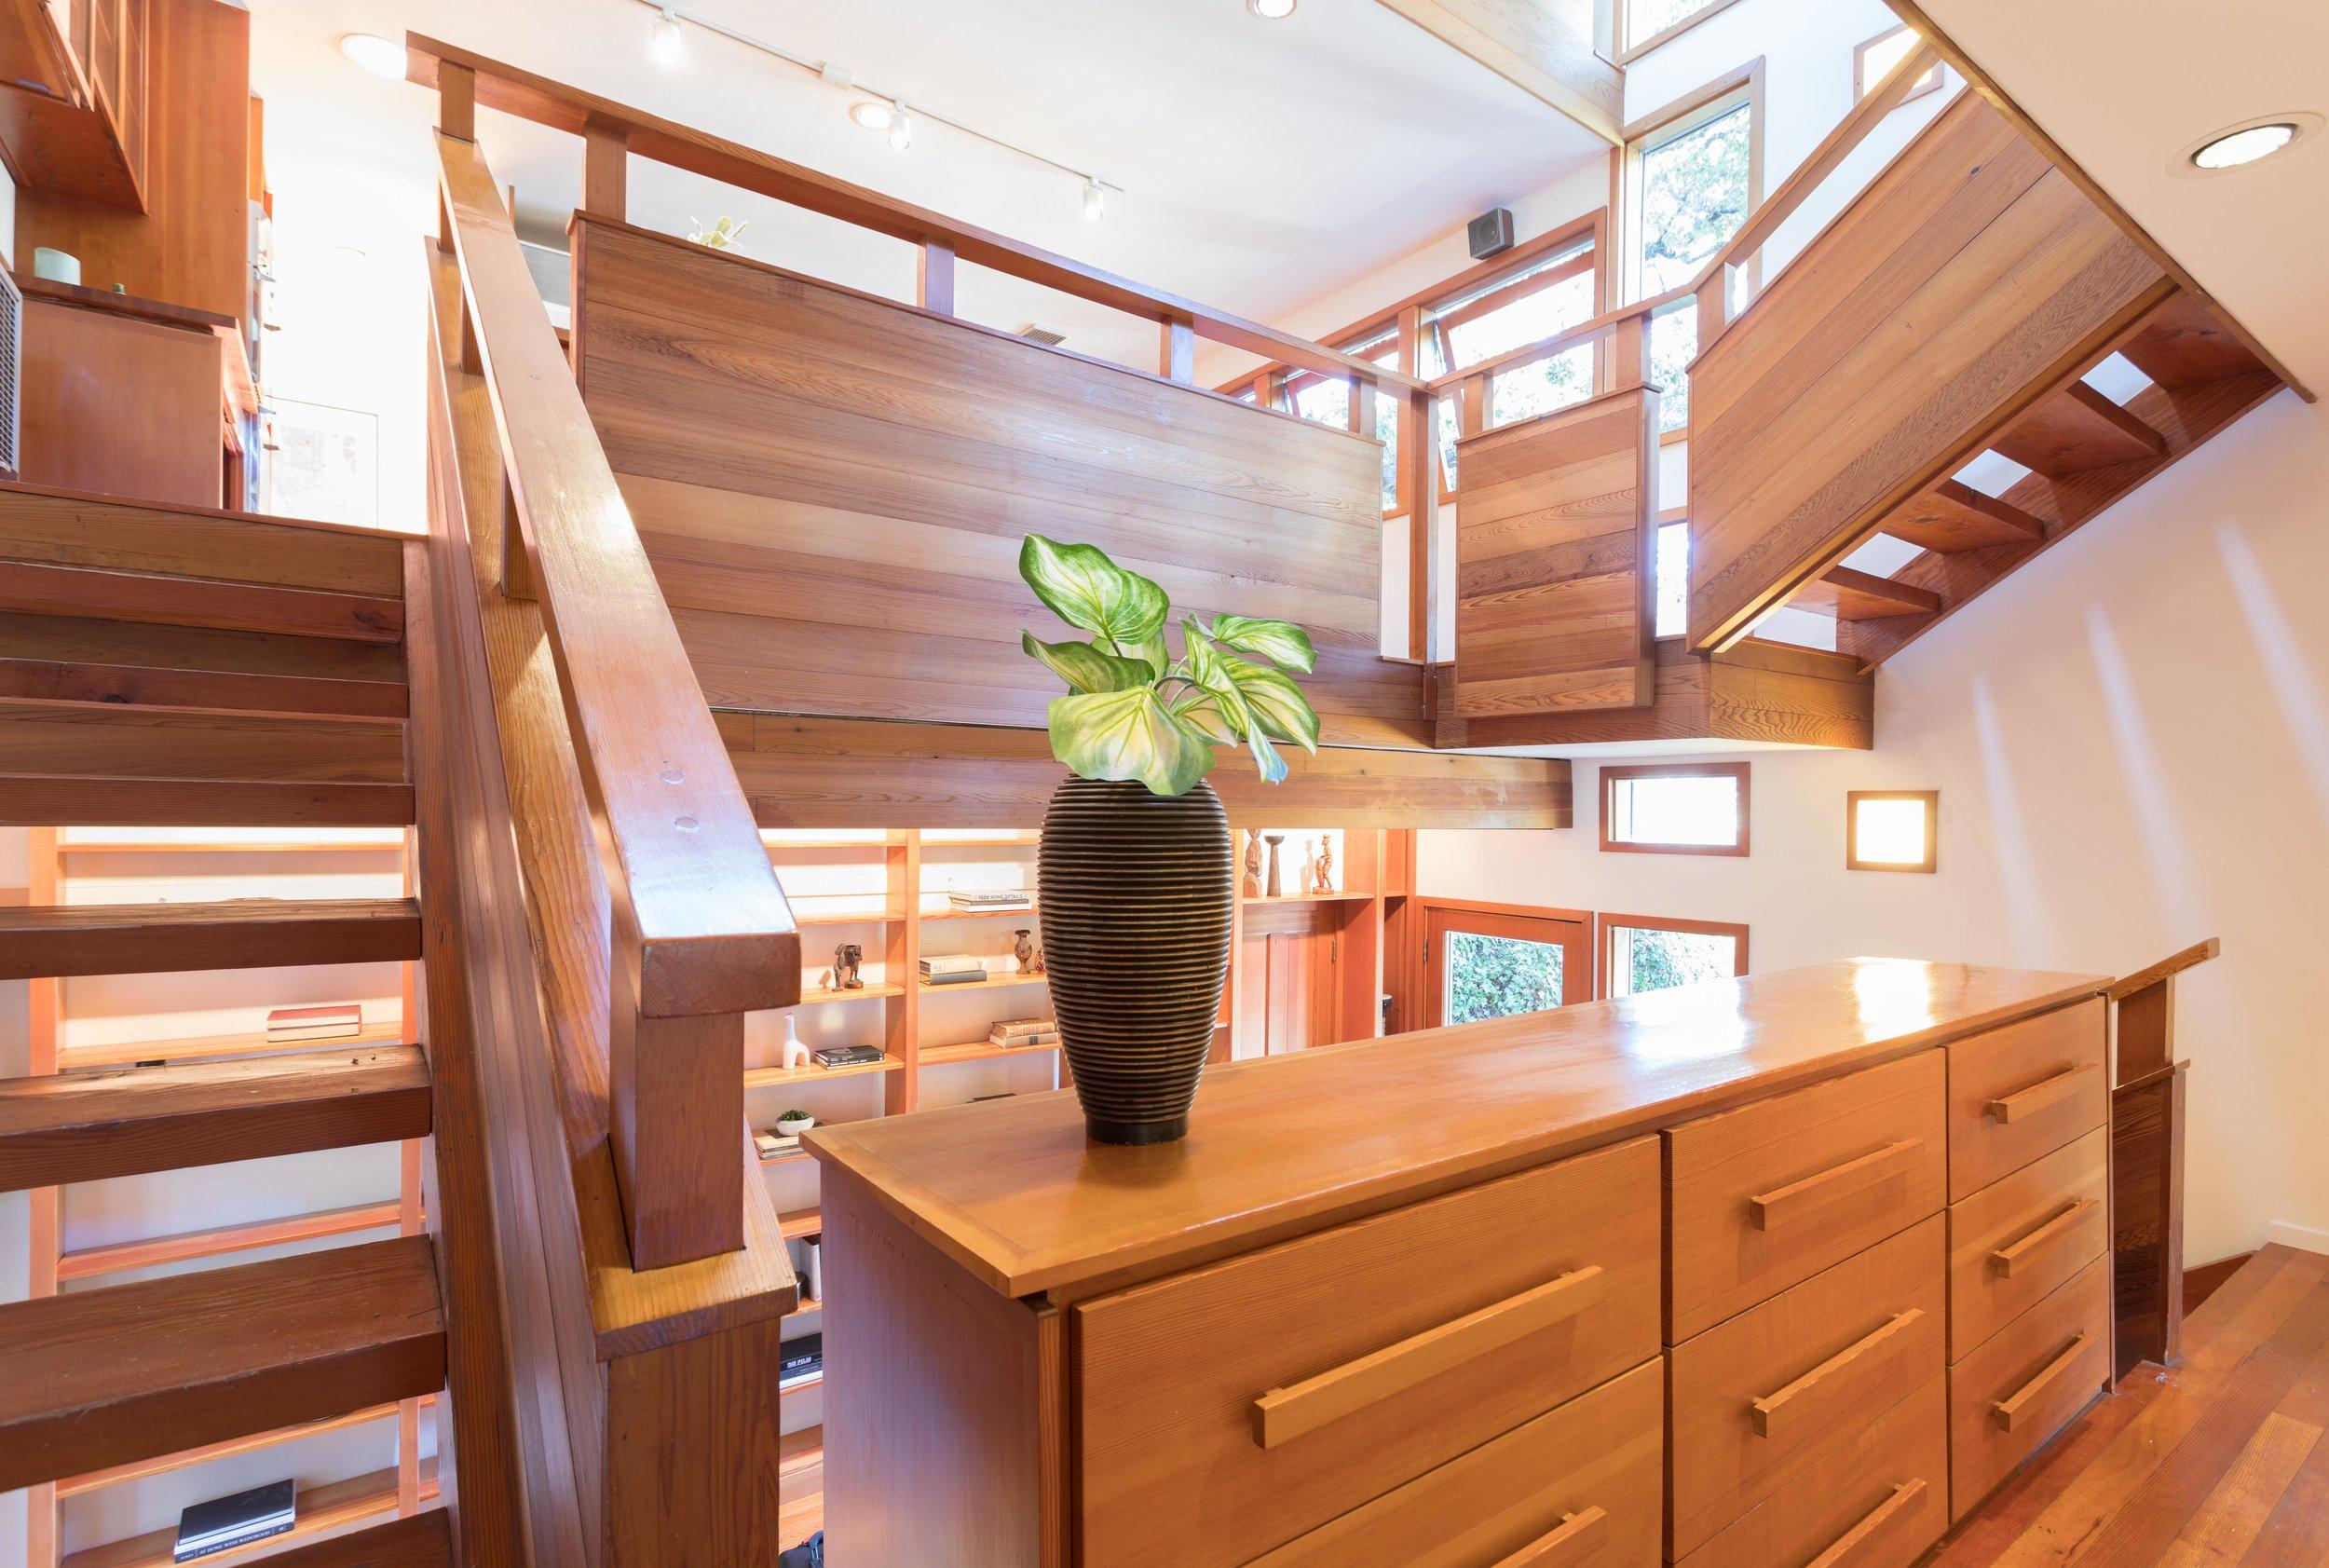 2353 Stanley Hills Dr - VirtuallyHereStudios.com-16.jpg